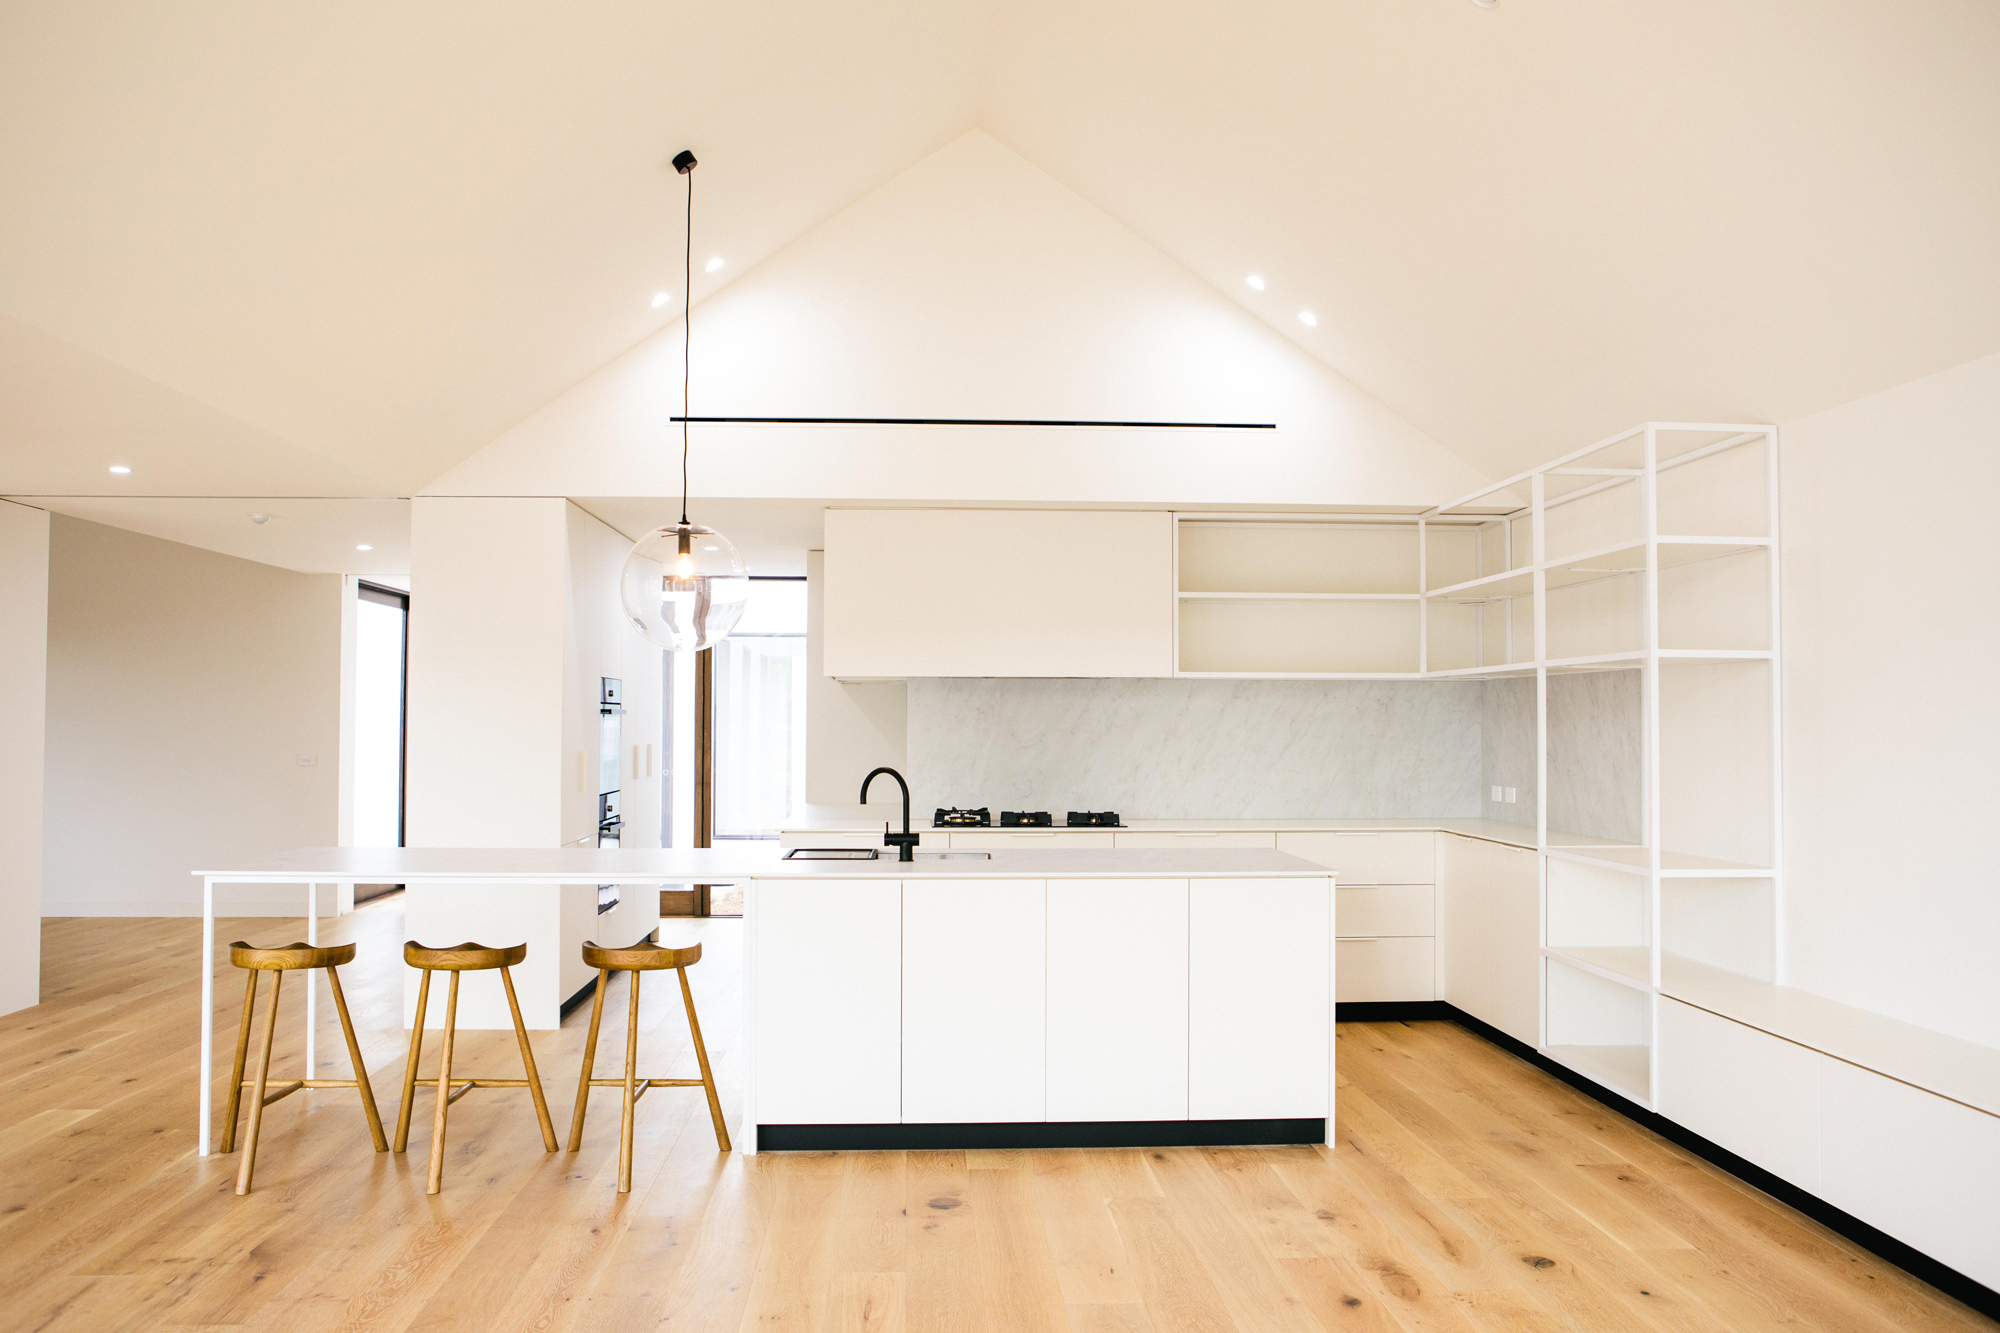 LIFESPACESGROUP_scandi_house_kitchen front on.jpg